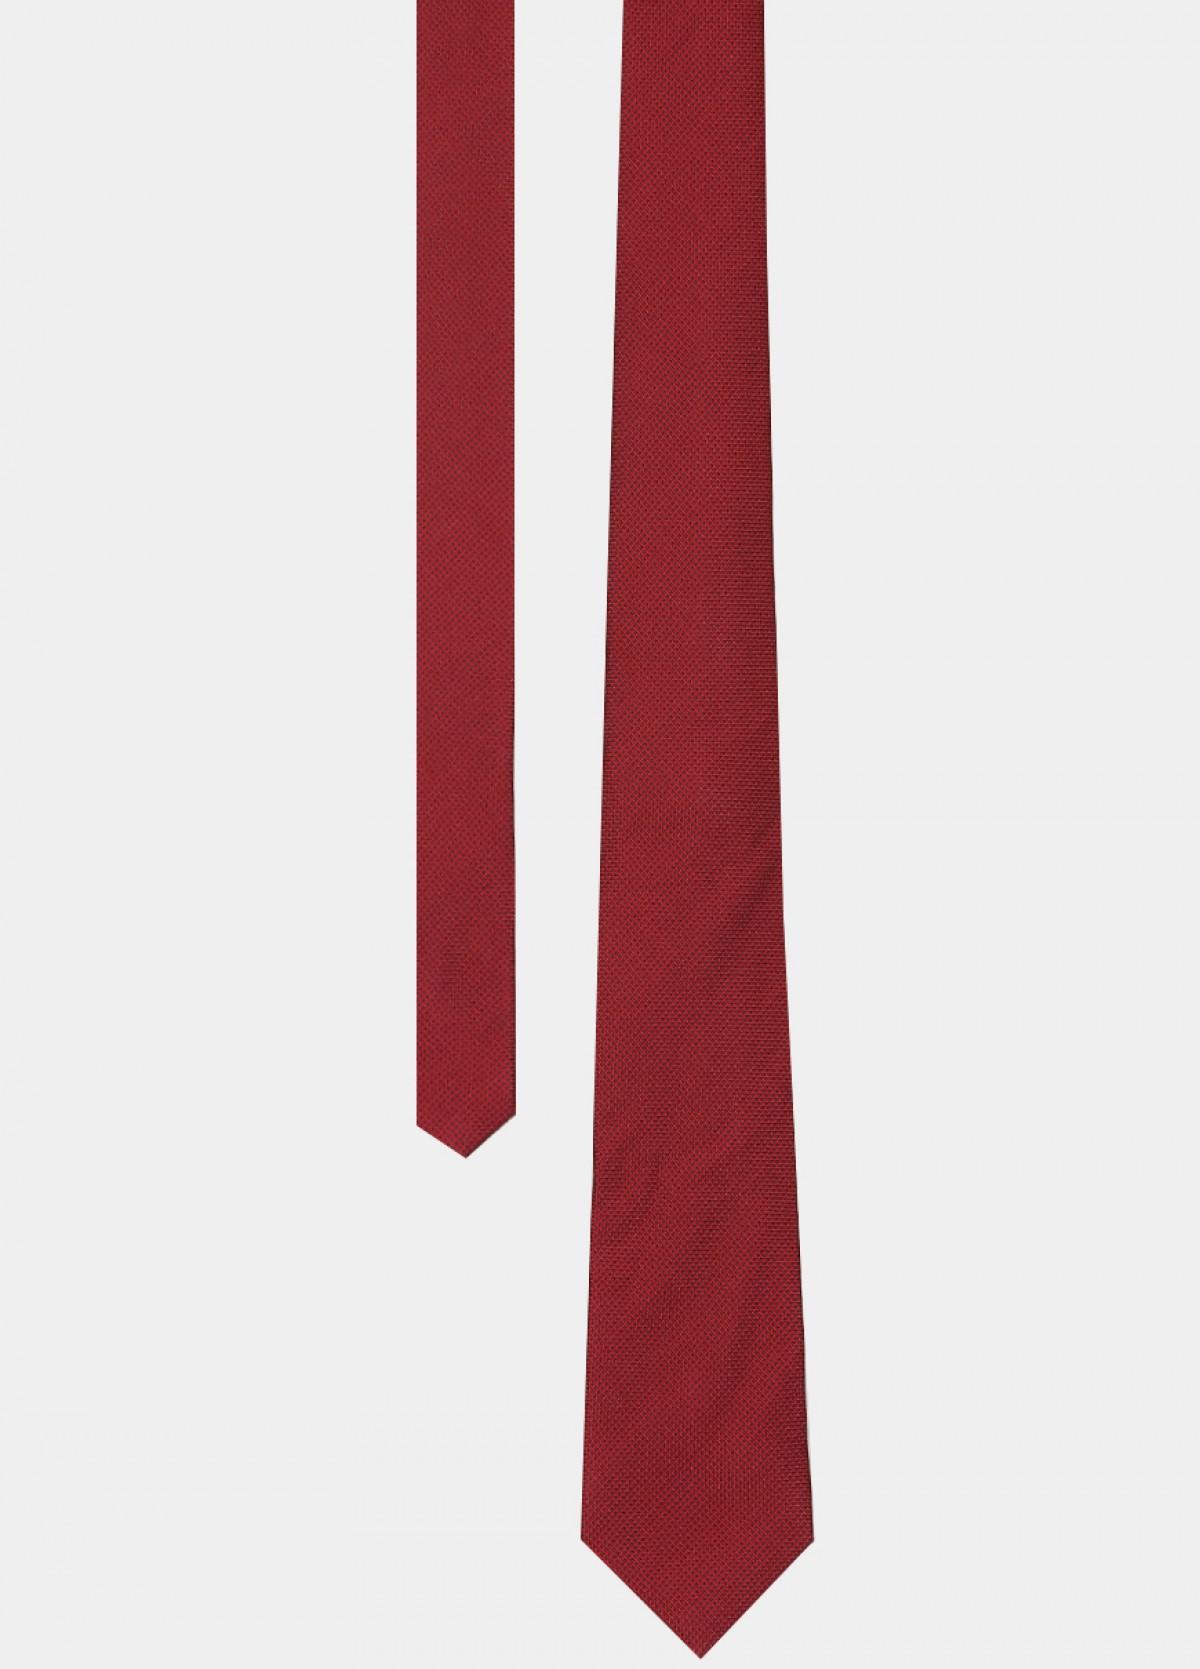 Red Woven Silk Tie